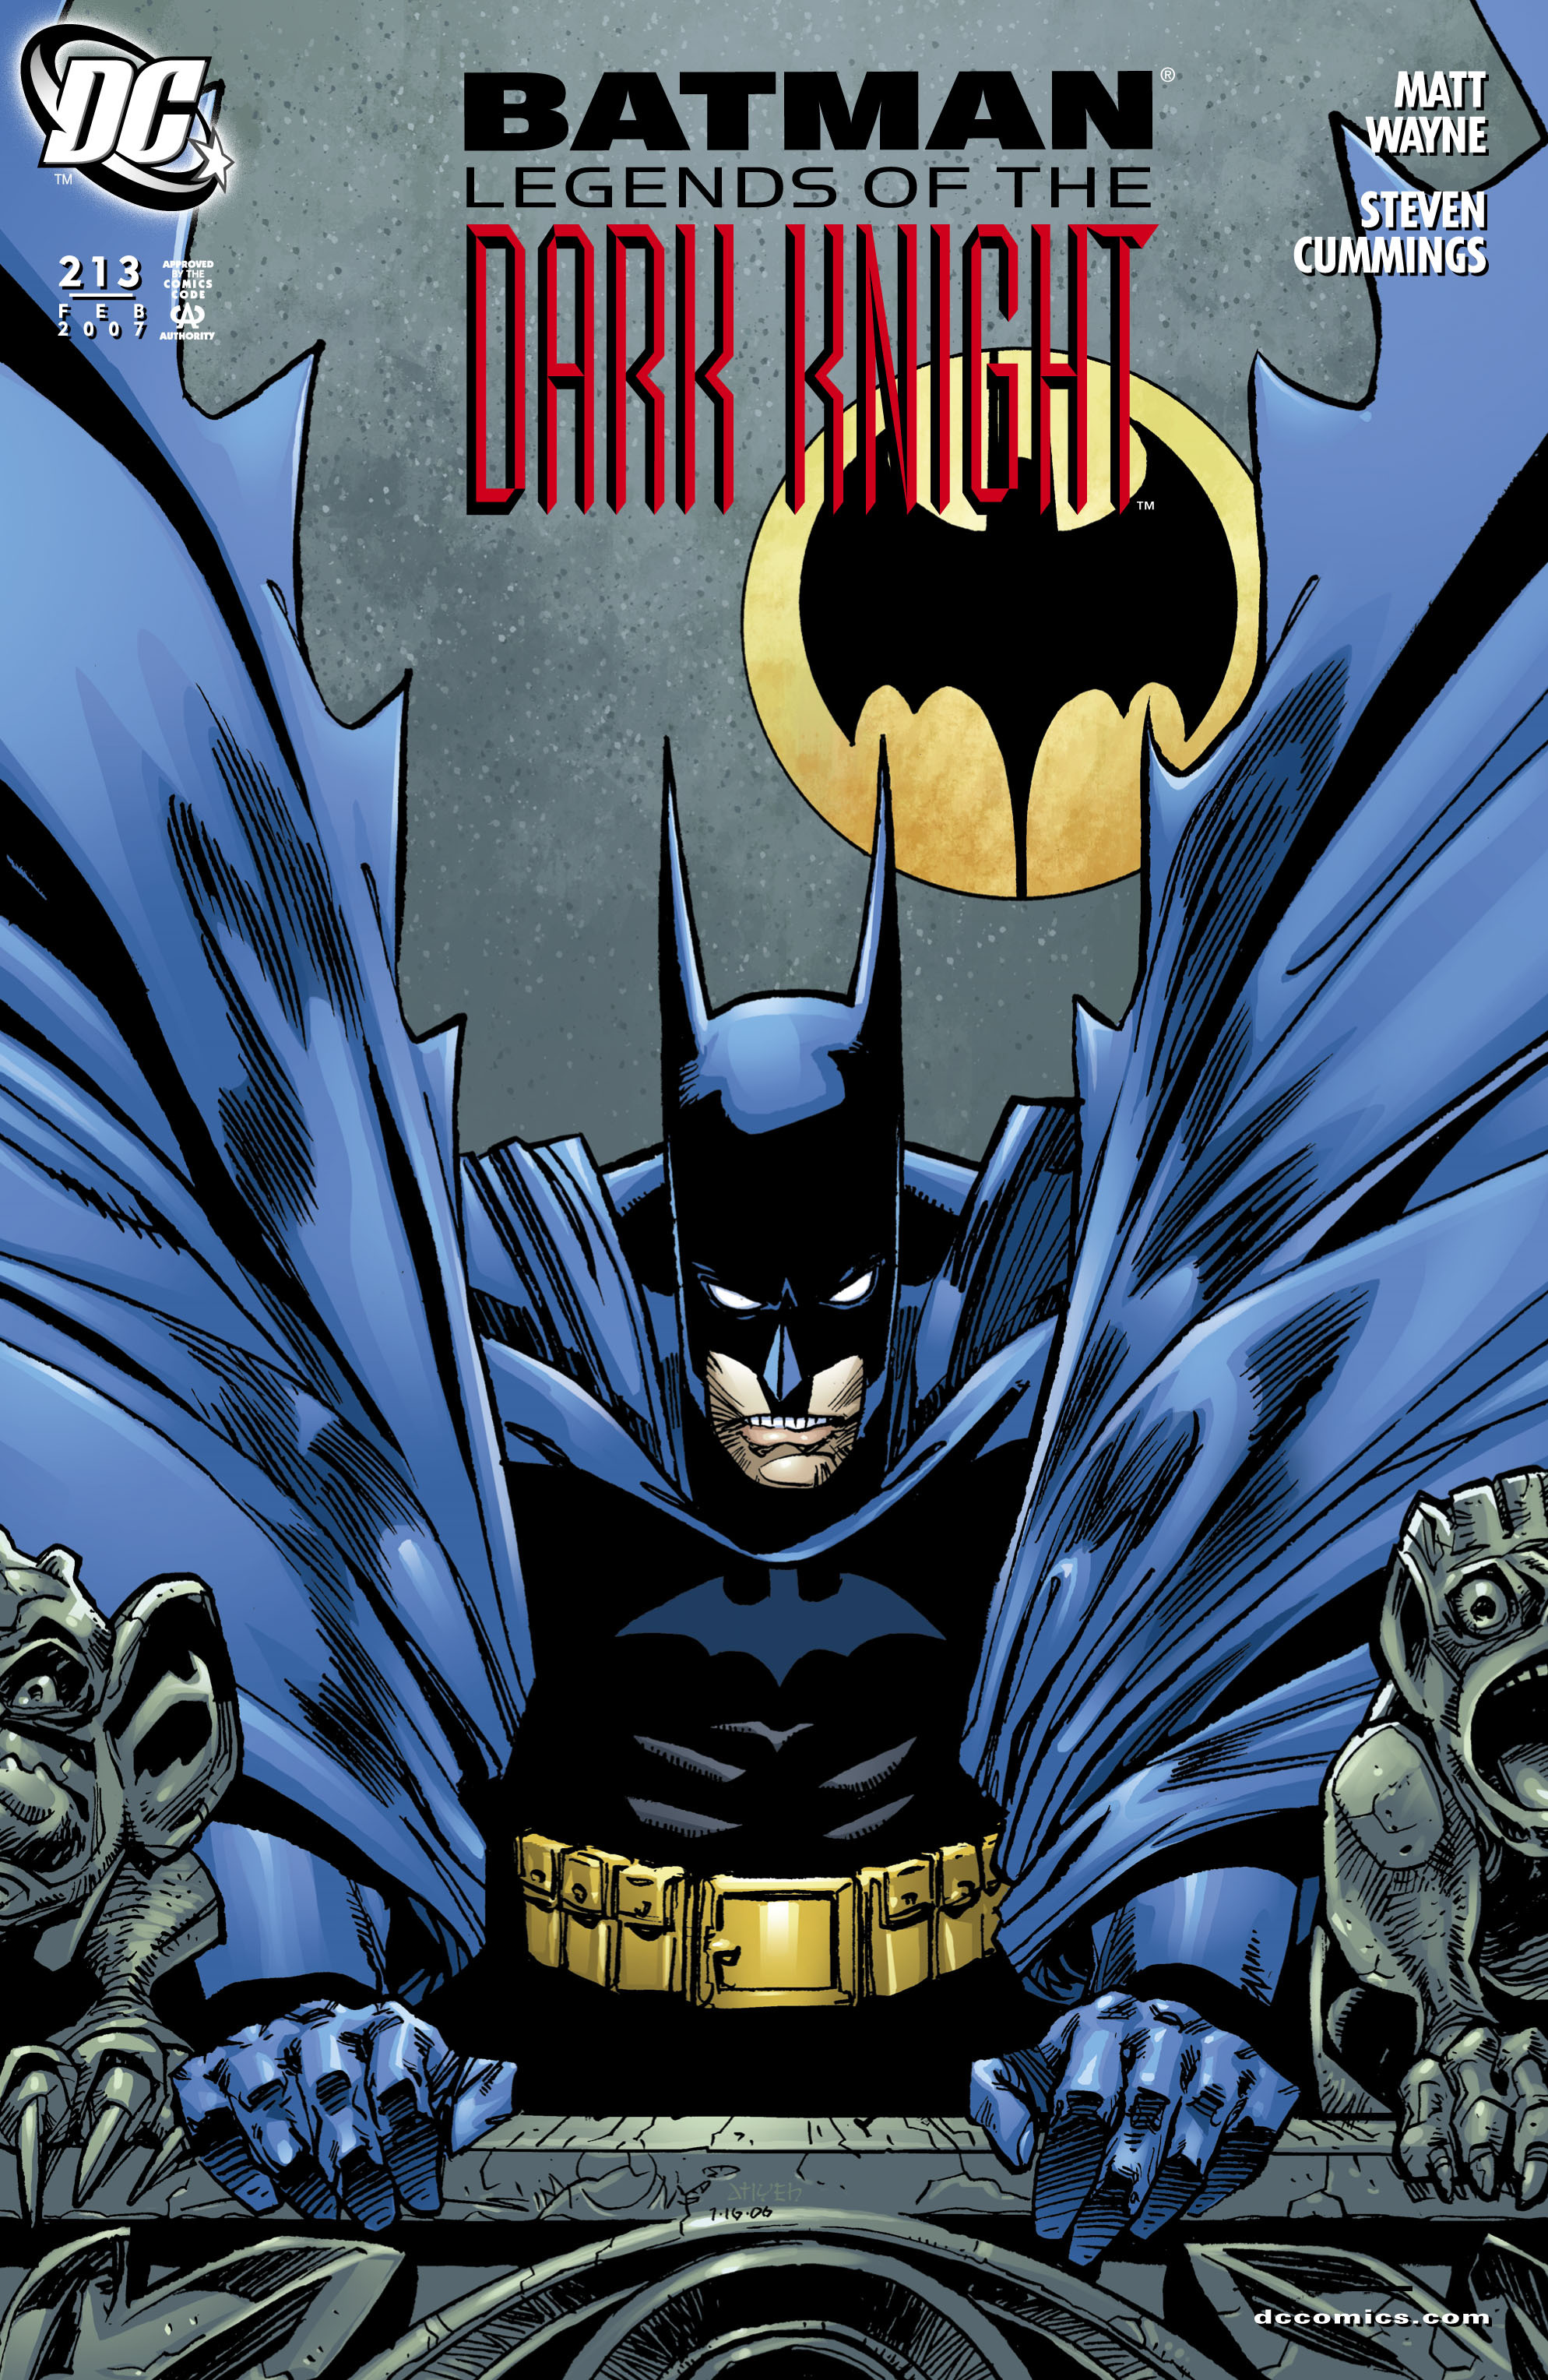 Batman: Legends of the Dark Knight 213 Page 1